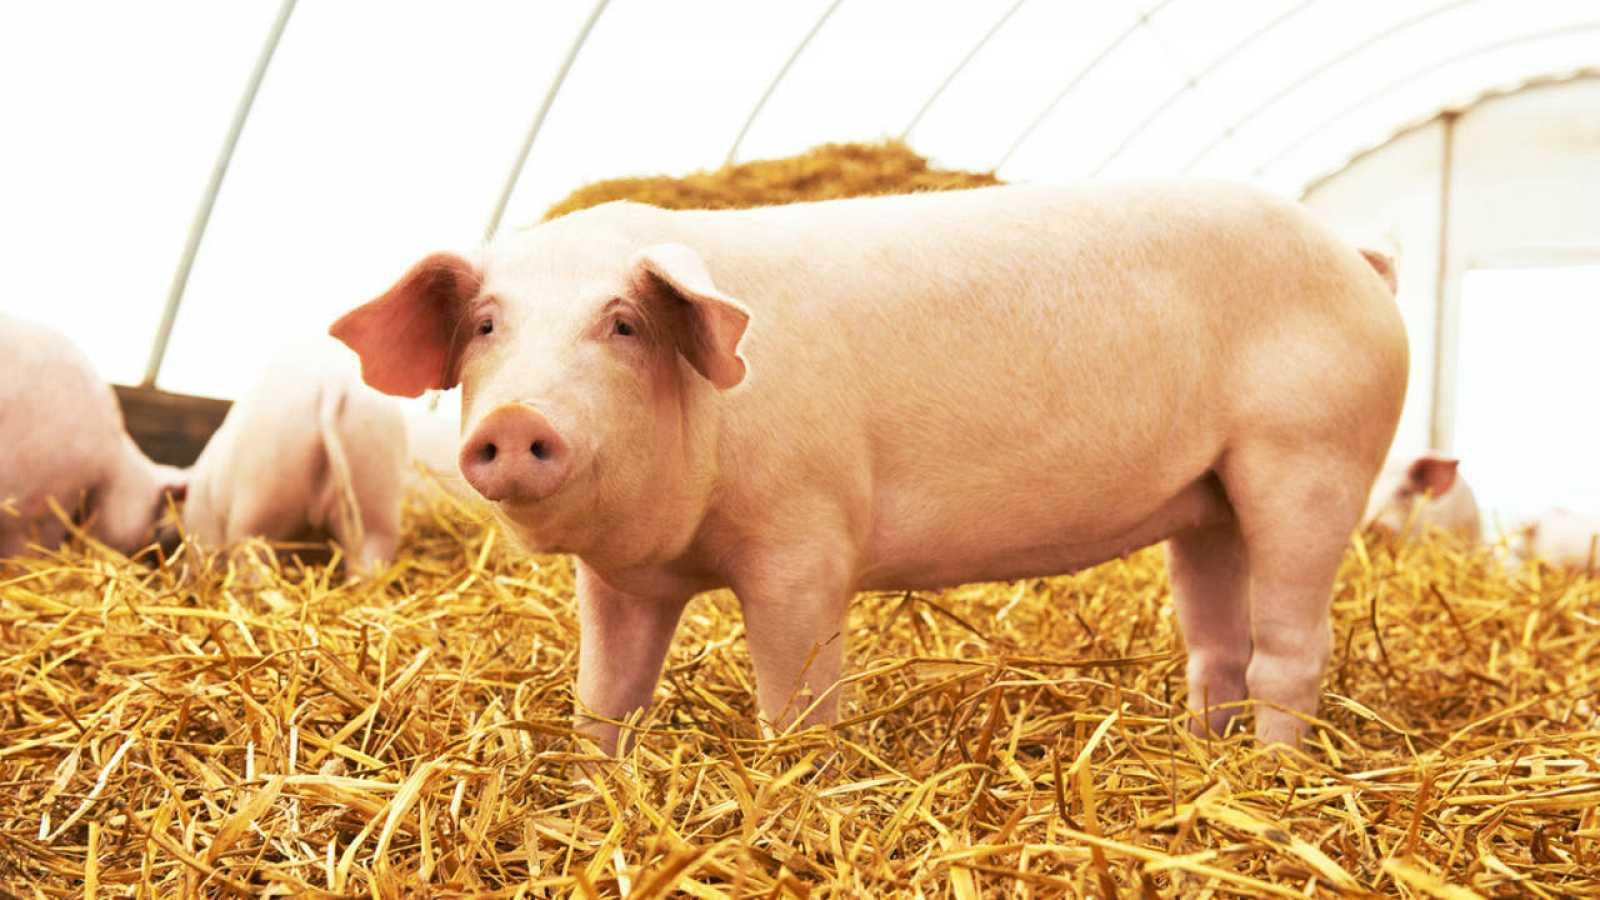 Francia: prohíben castración de cerdos sin anestesia